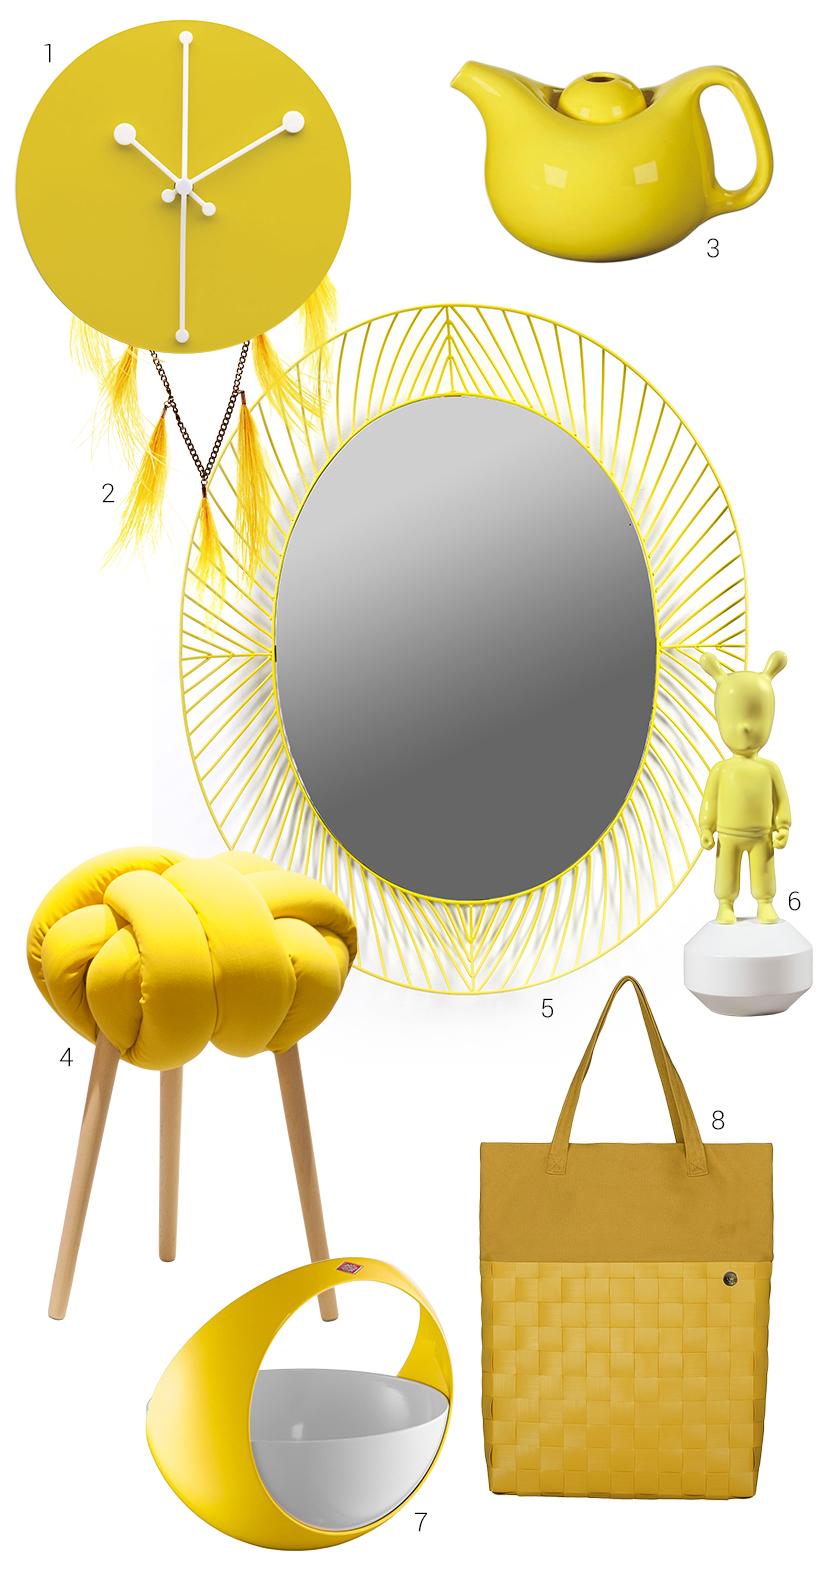 Design-Gelb-Trend-Farbe-Alessi-Sweet Delux- Kähler-Knots Studio-Serax-Lladró-Wesco-Handed By-01